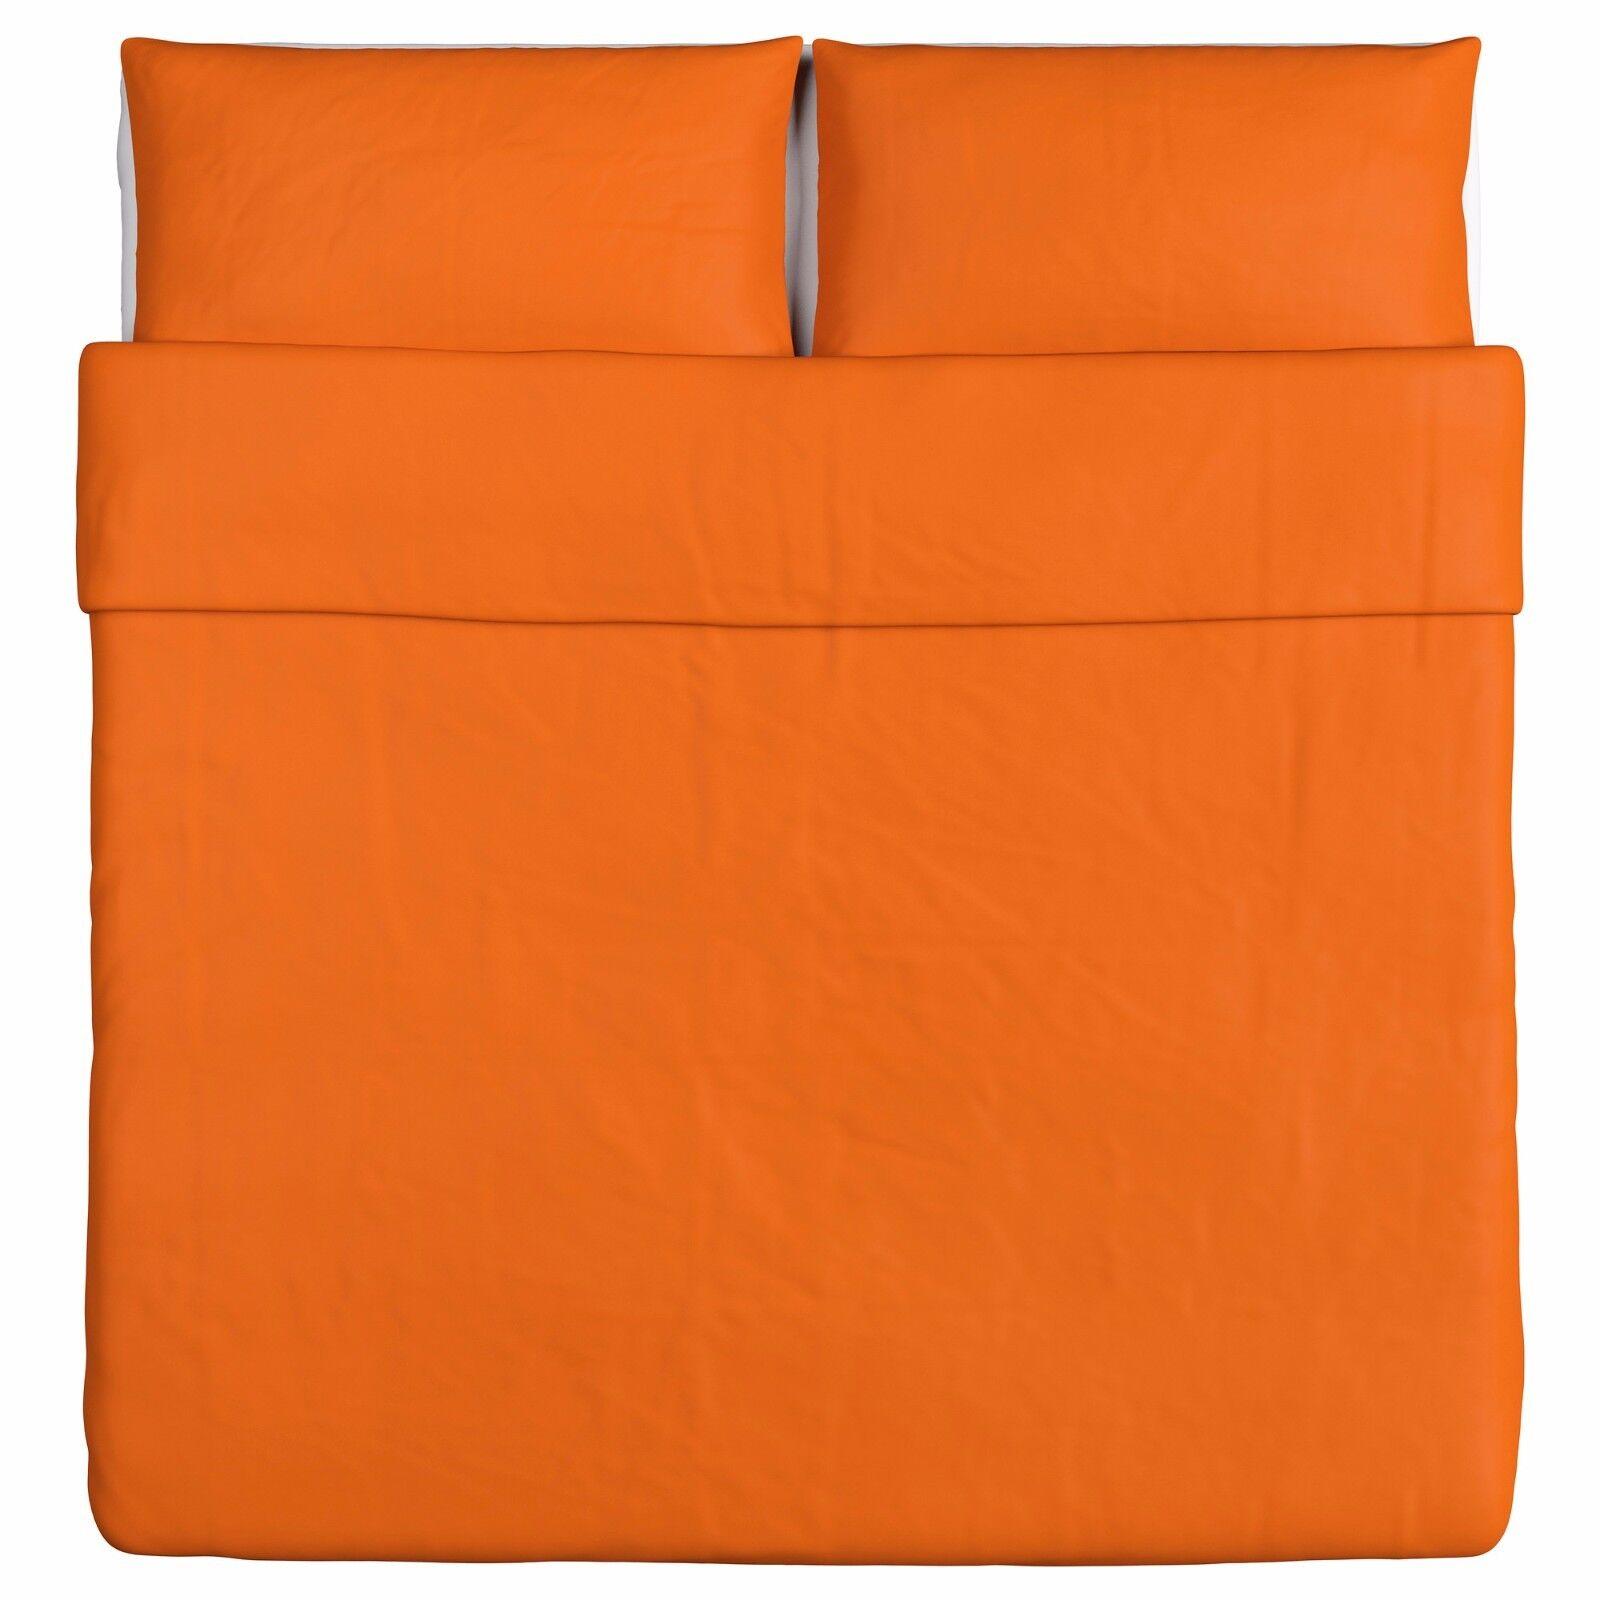 New IKEA DVALA King Duvet Cover And 2 Pillowcase Set, arancia 100% Cotton